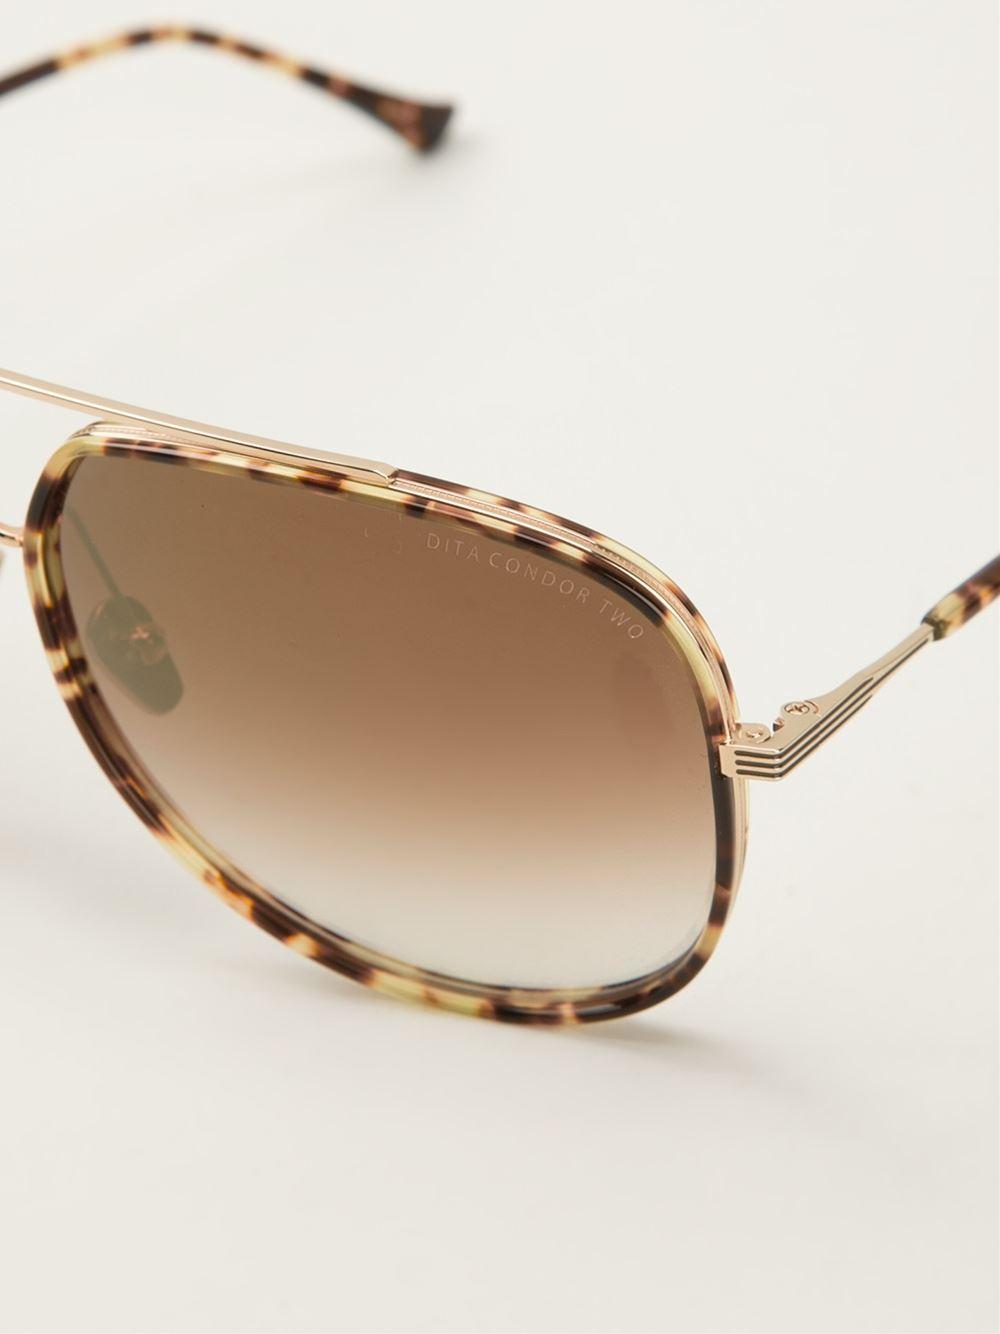 9557683a4ec Dita Condor Metal Aviator Sunglasses « Heritage Malta